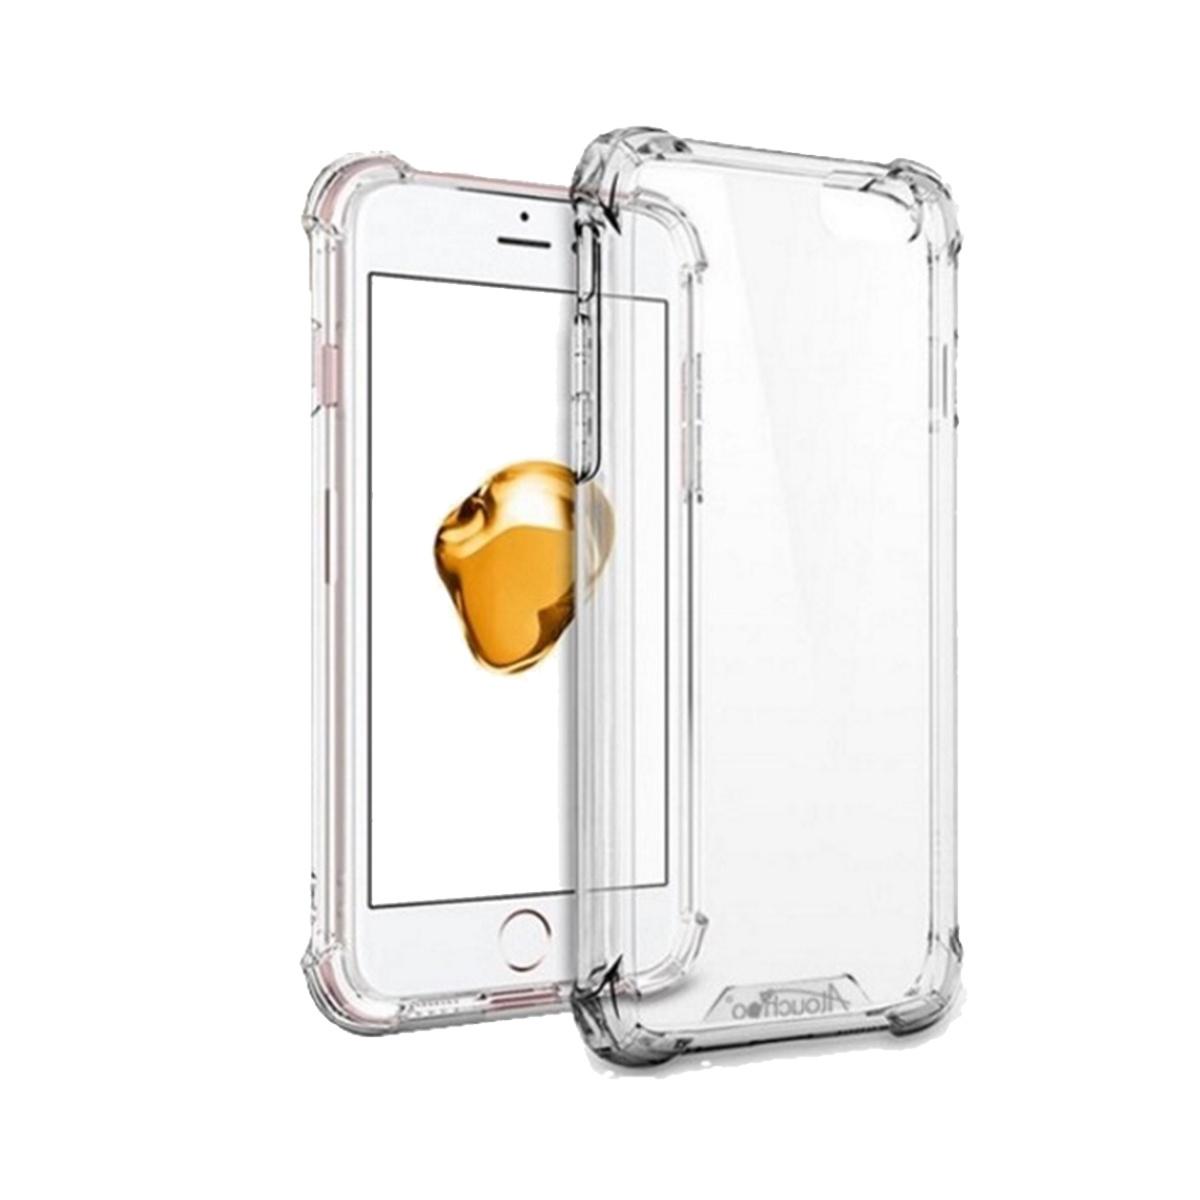 King Kong Armor anti-burst hoesje voor  iPhone 5 SE